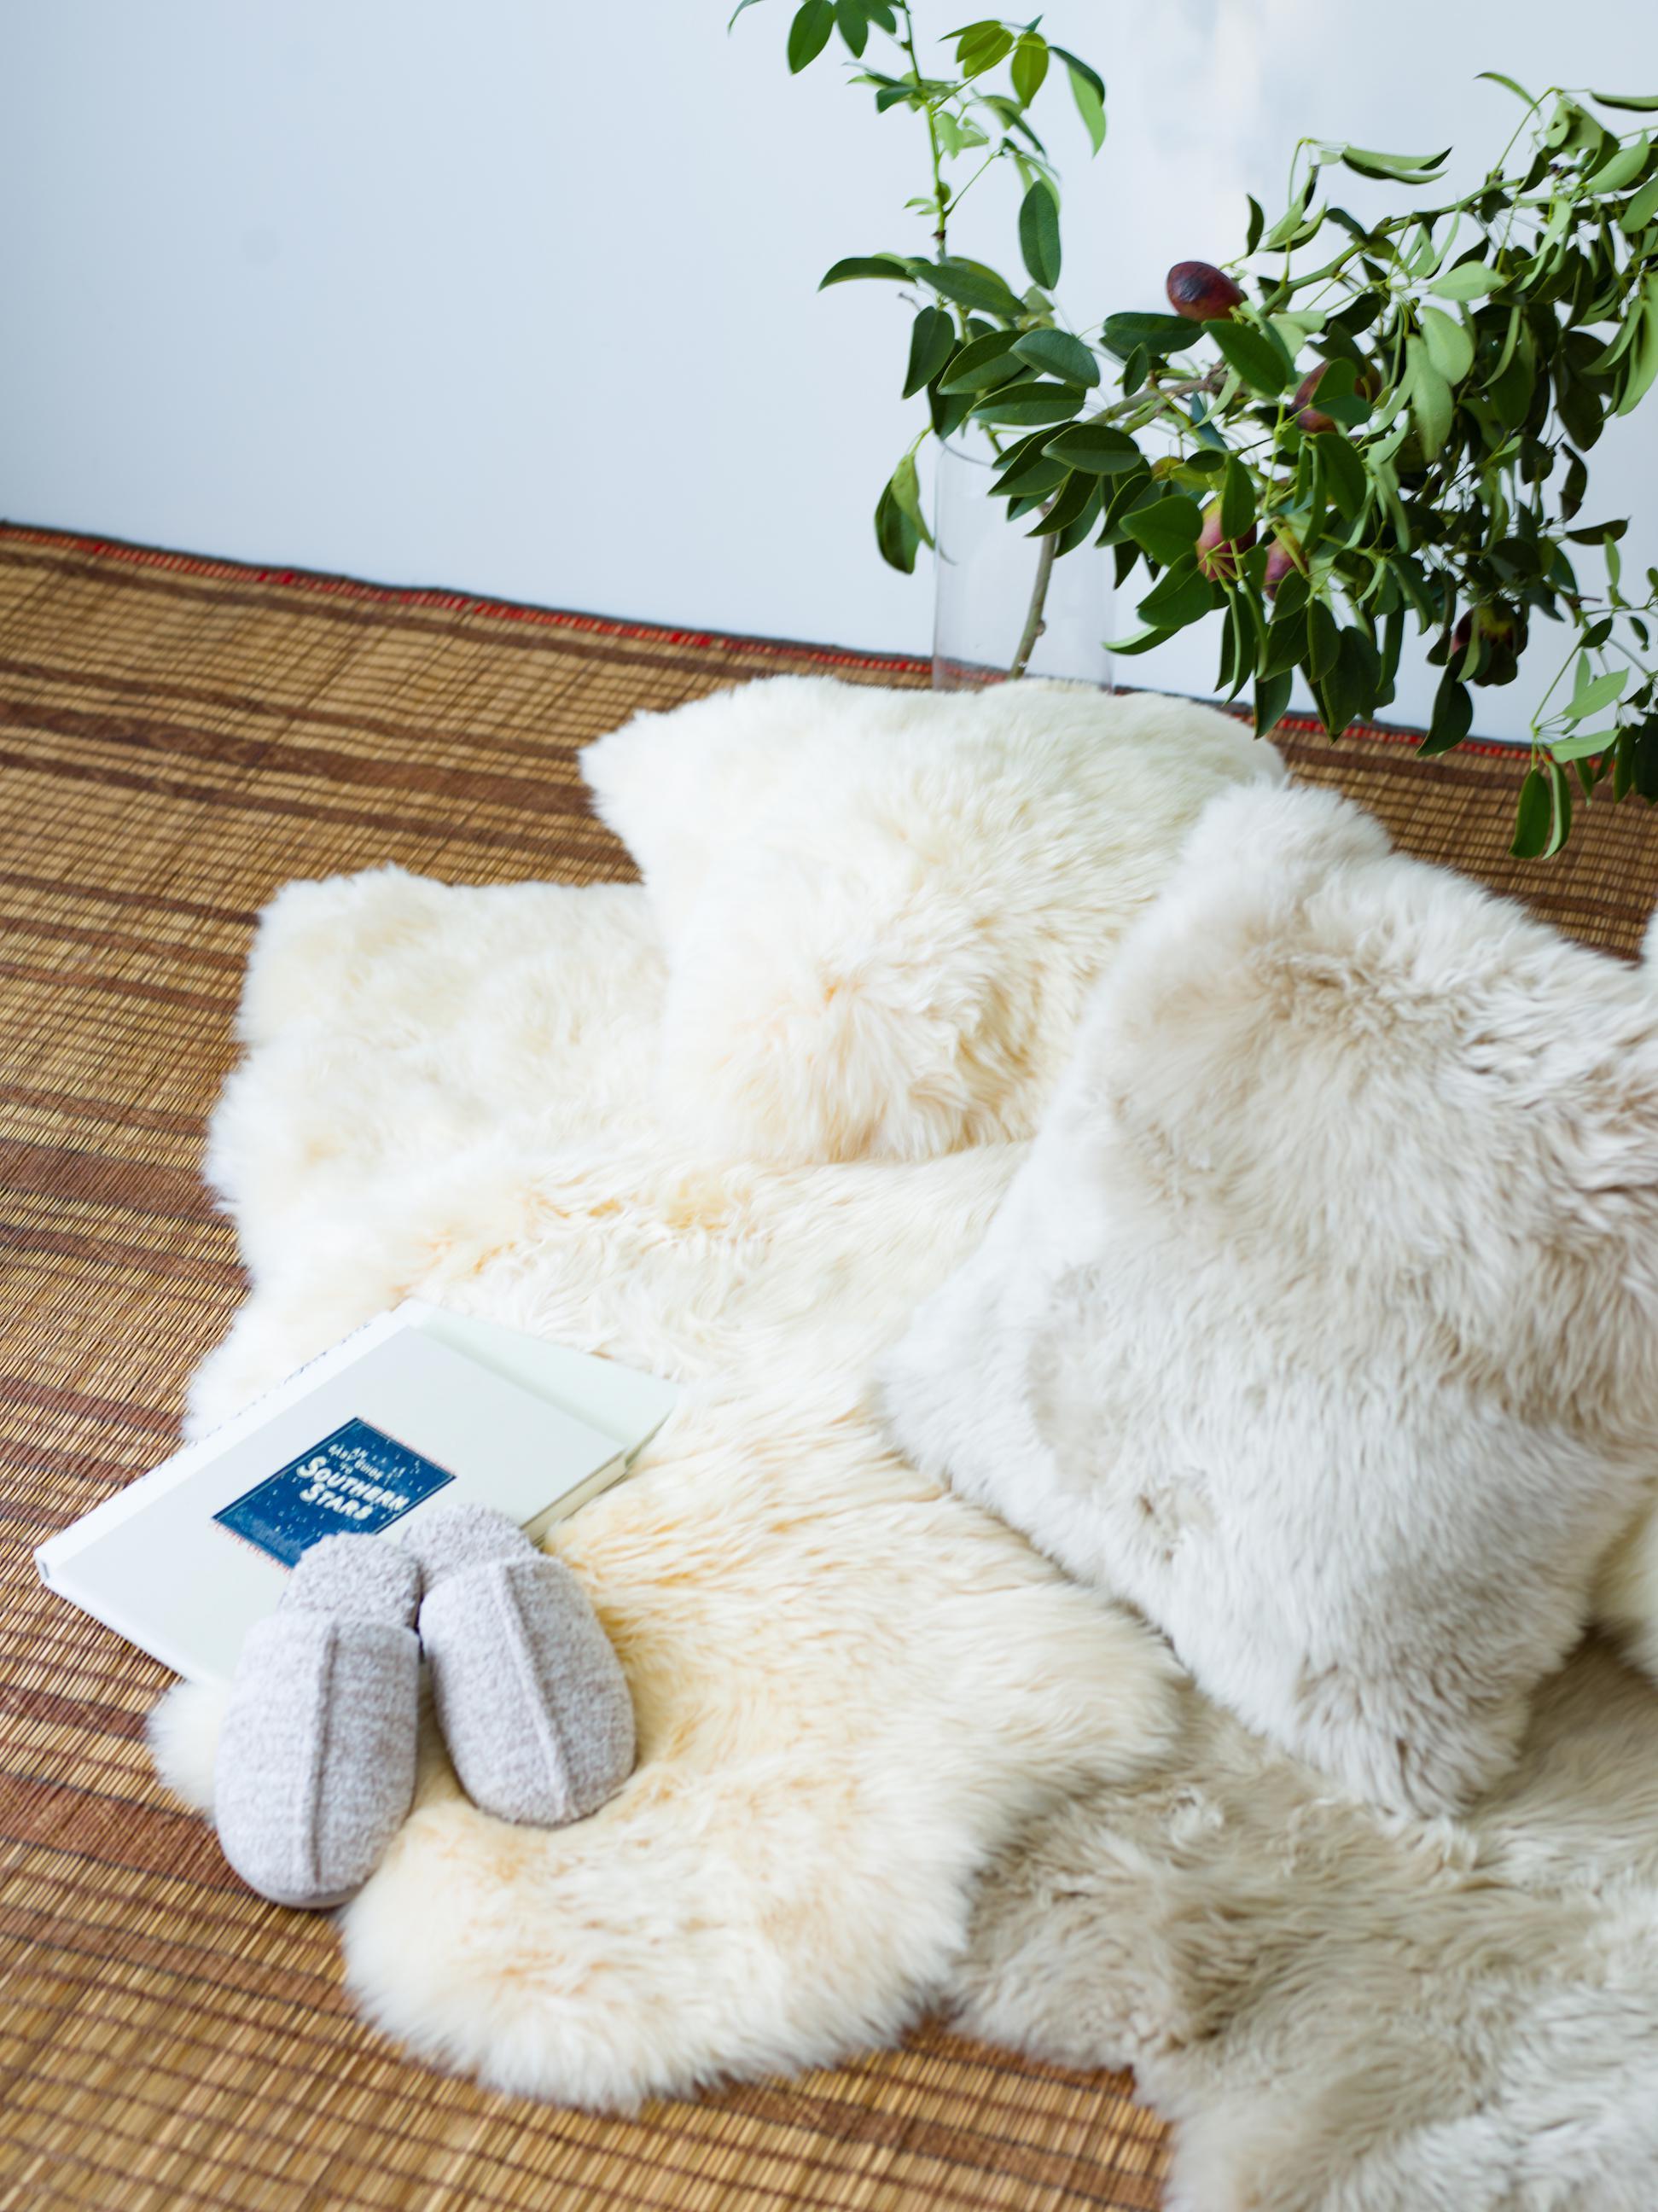 39 rug ¥16,000 cushion ¥11,000